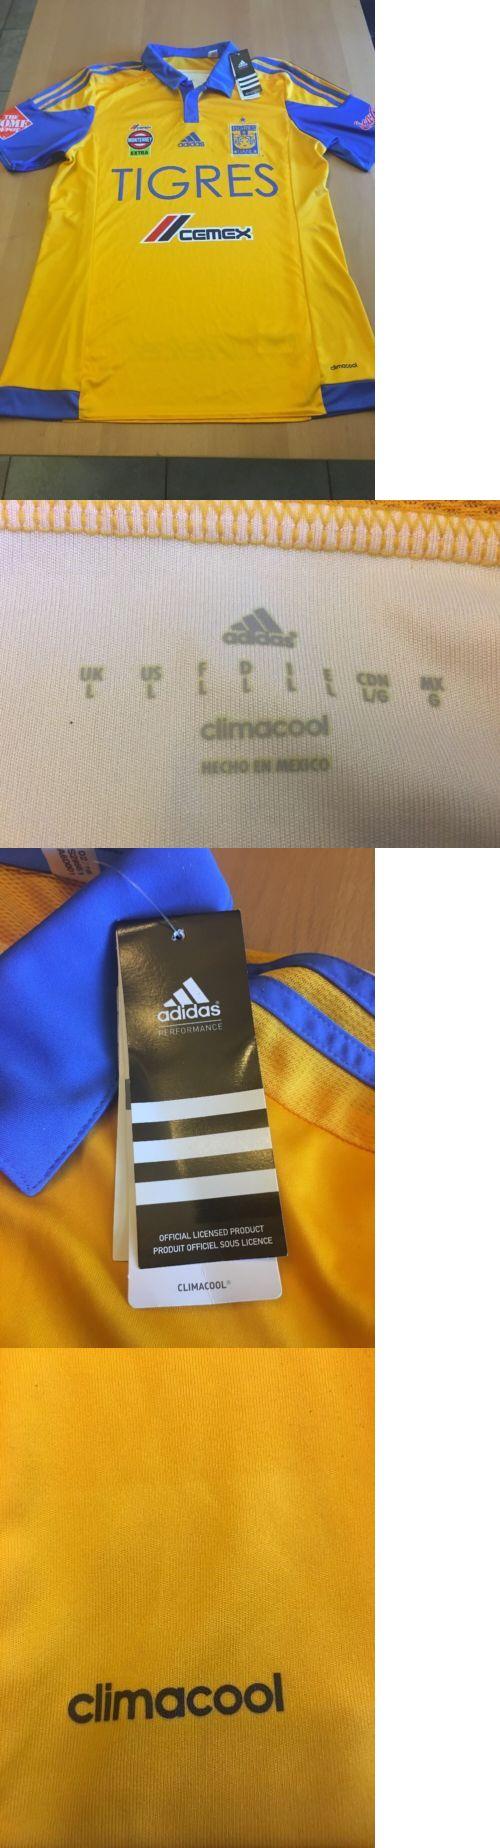 Men 123490: Tigres Uanl Adidas Jersey Original Temporada 2015-2016 Size L BUY IT NOW ONLY: $69.95